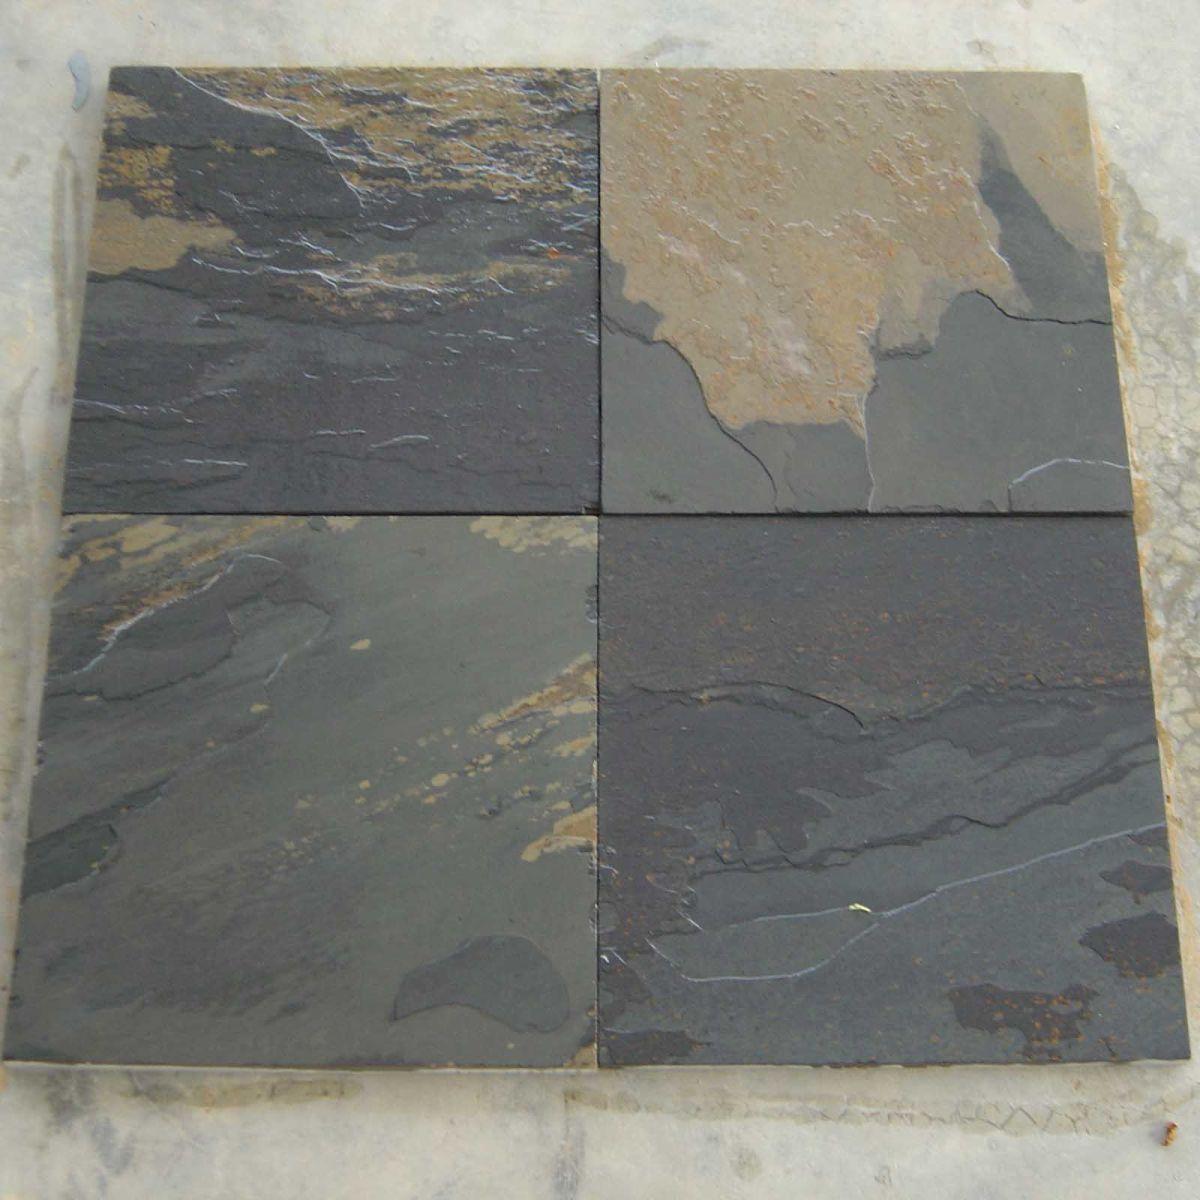 Black Rustic Slatestone